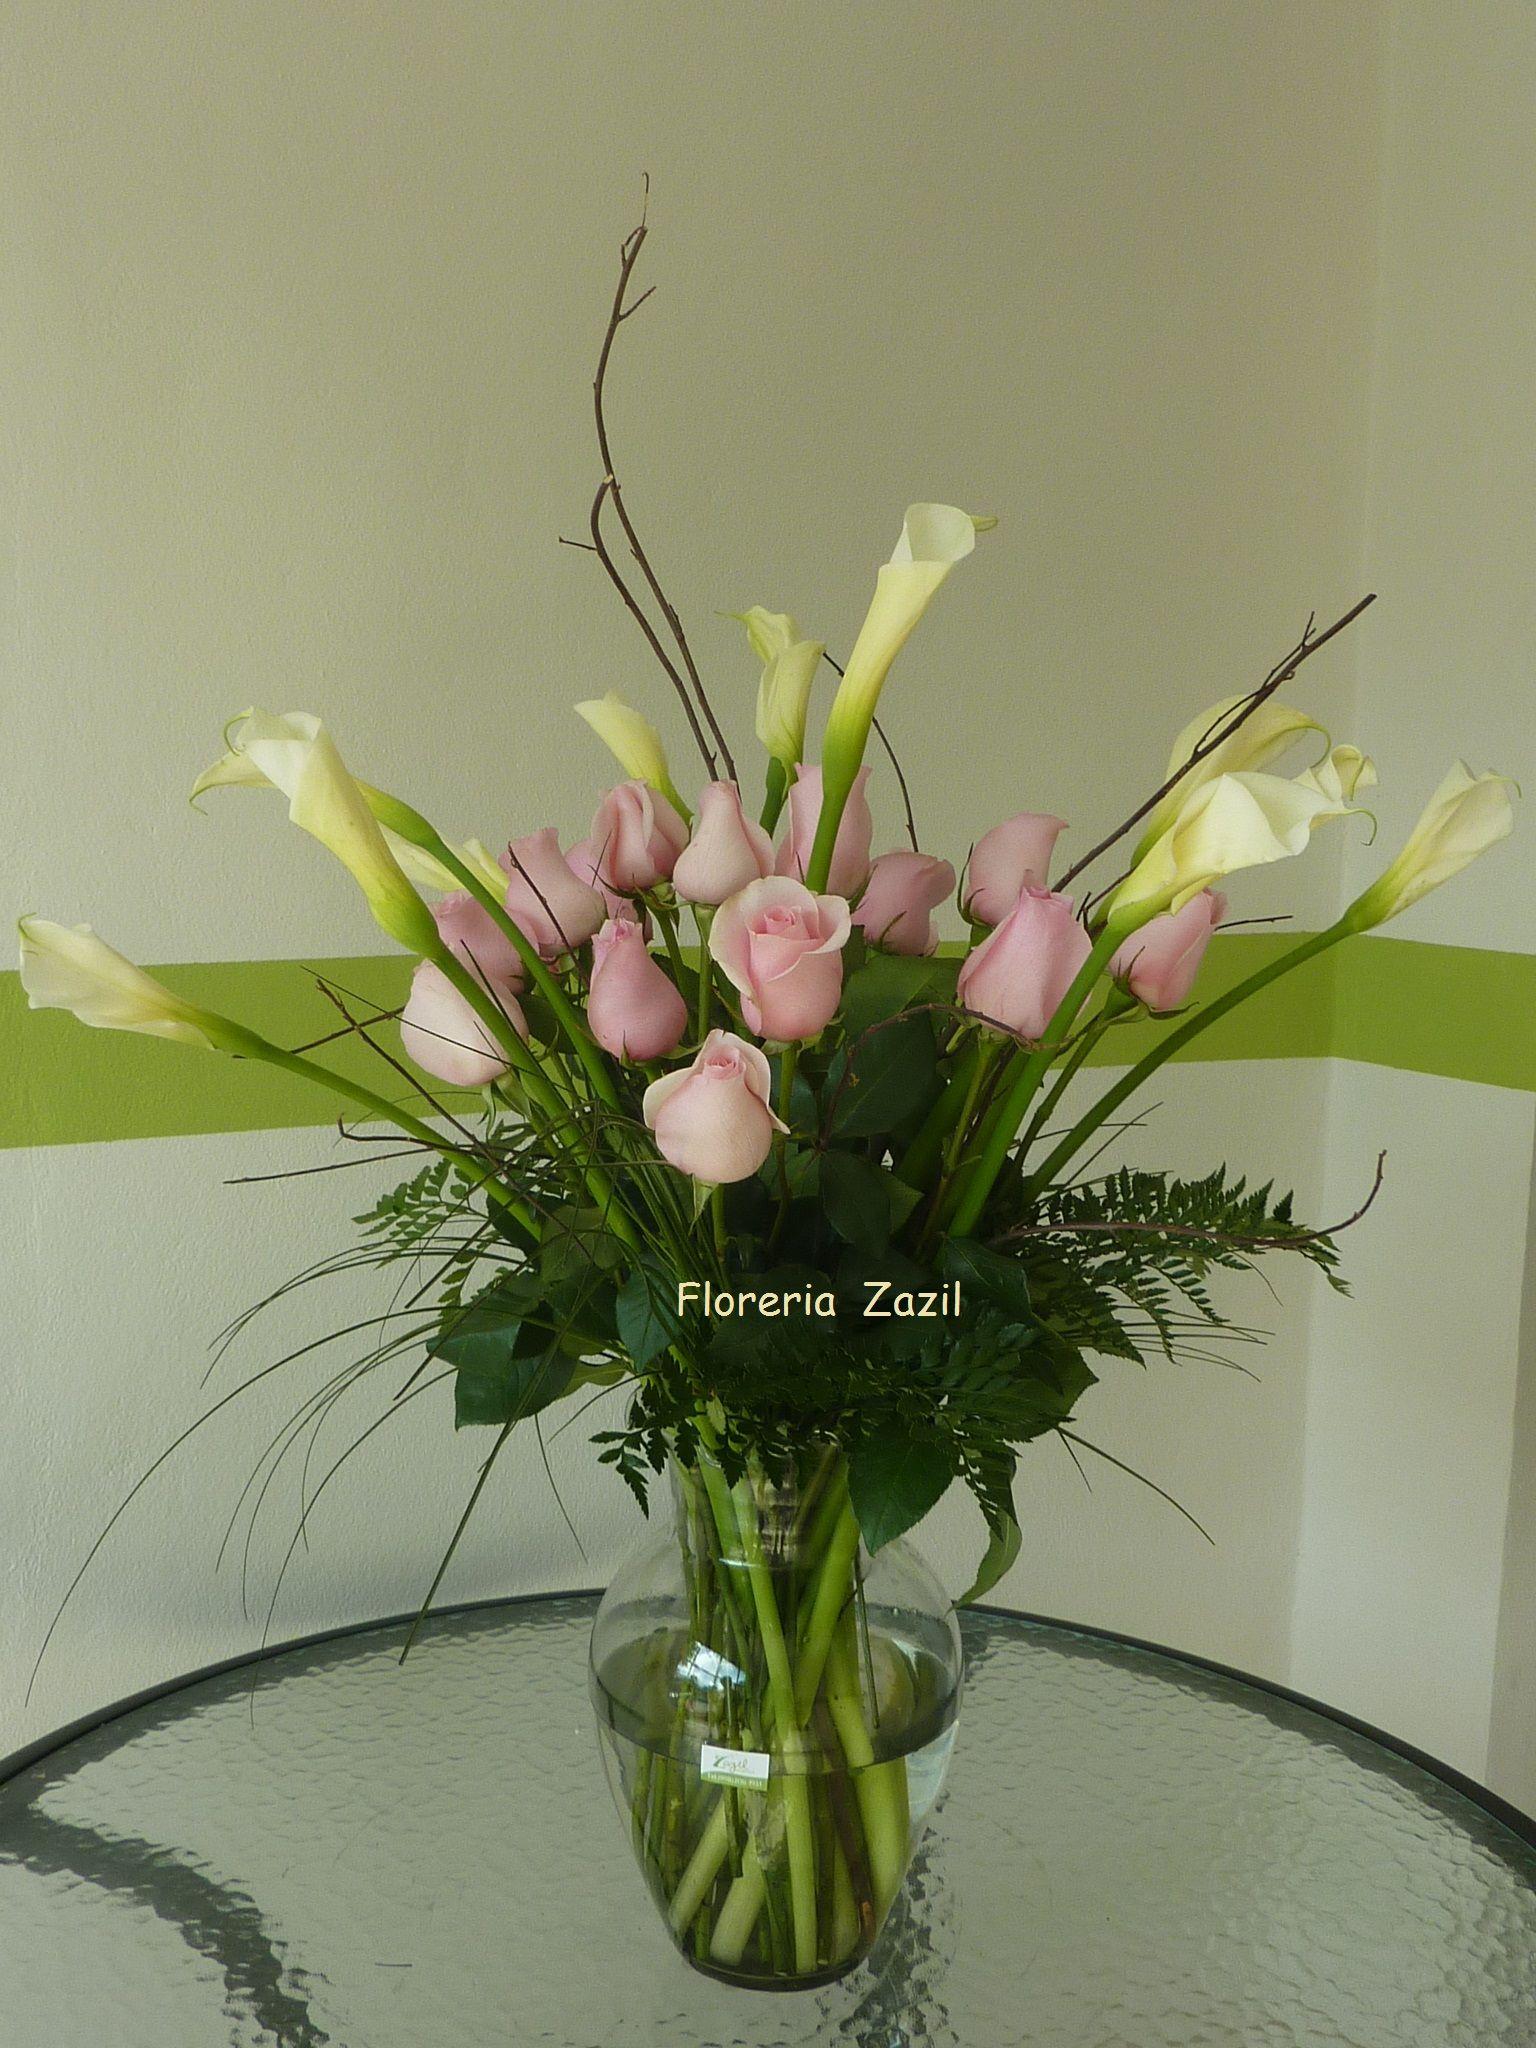 Roses & White calla lillies #floreriascancun #floresbodascancun #Diseñofloracancun